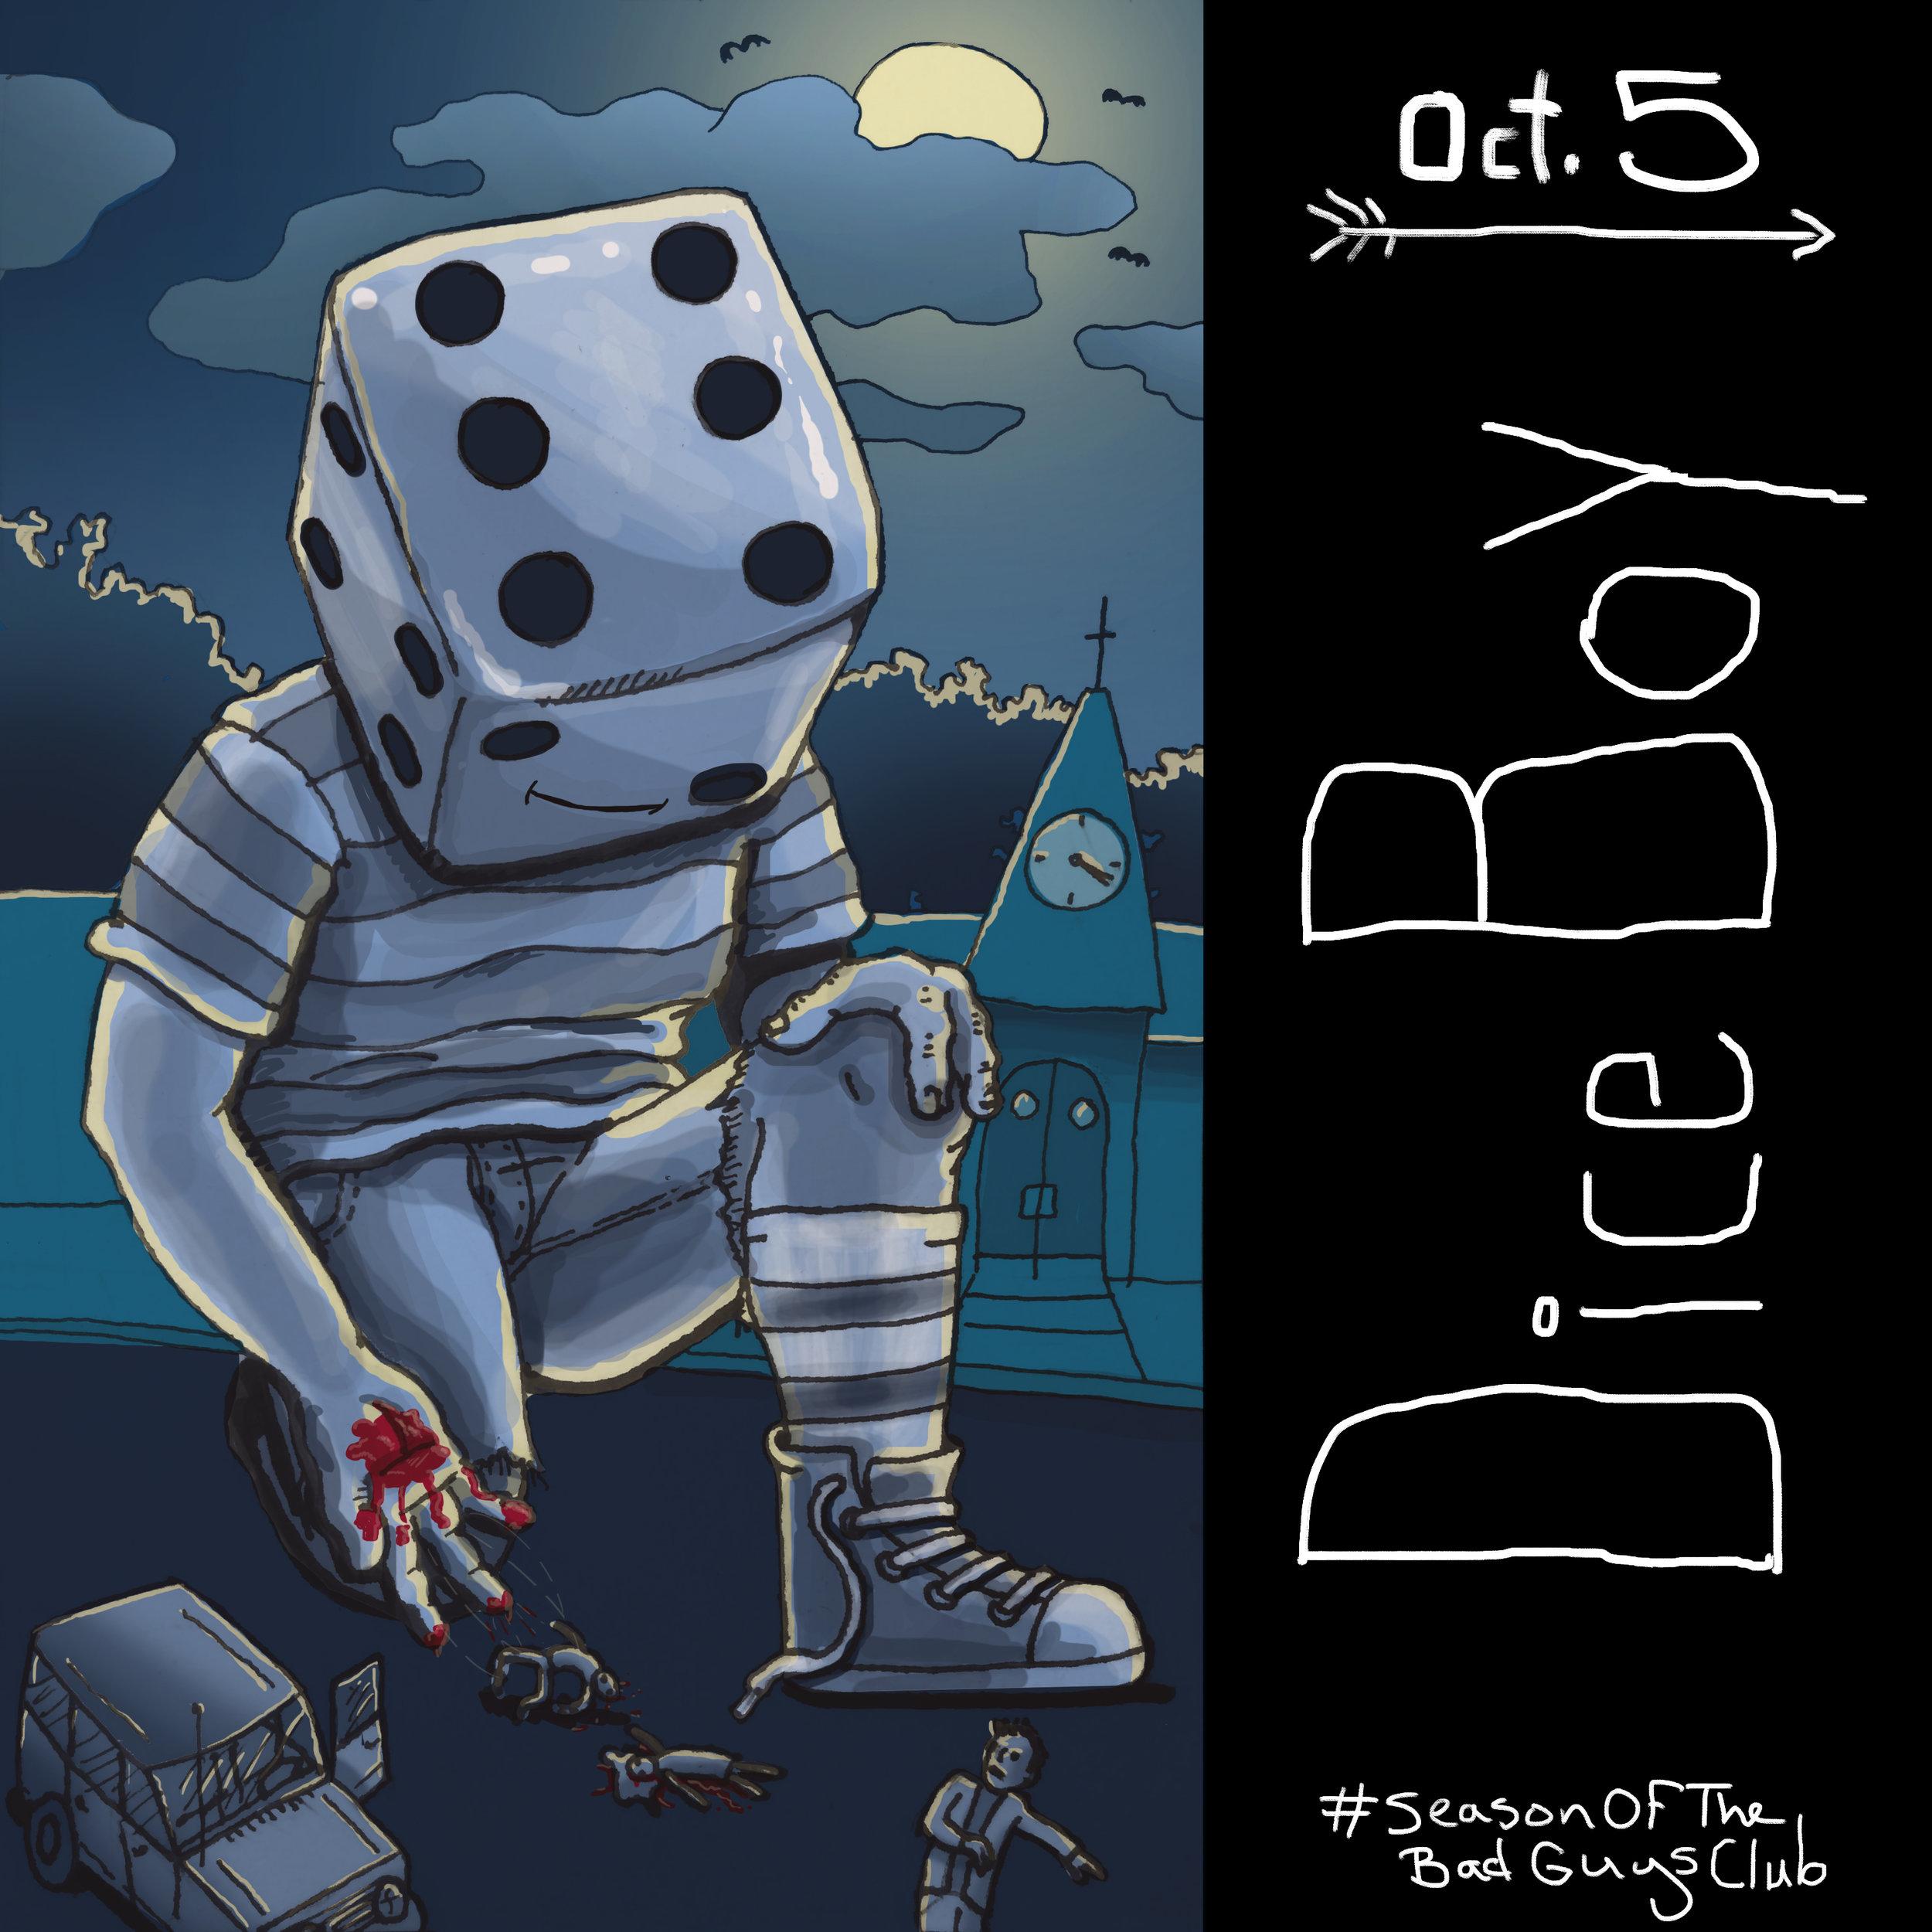 DiceBoy.jpg